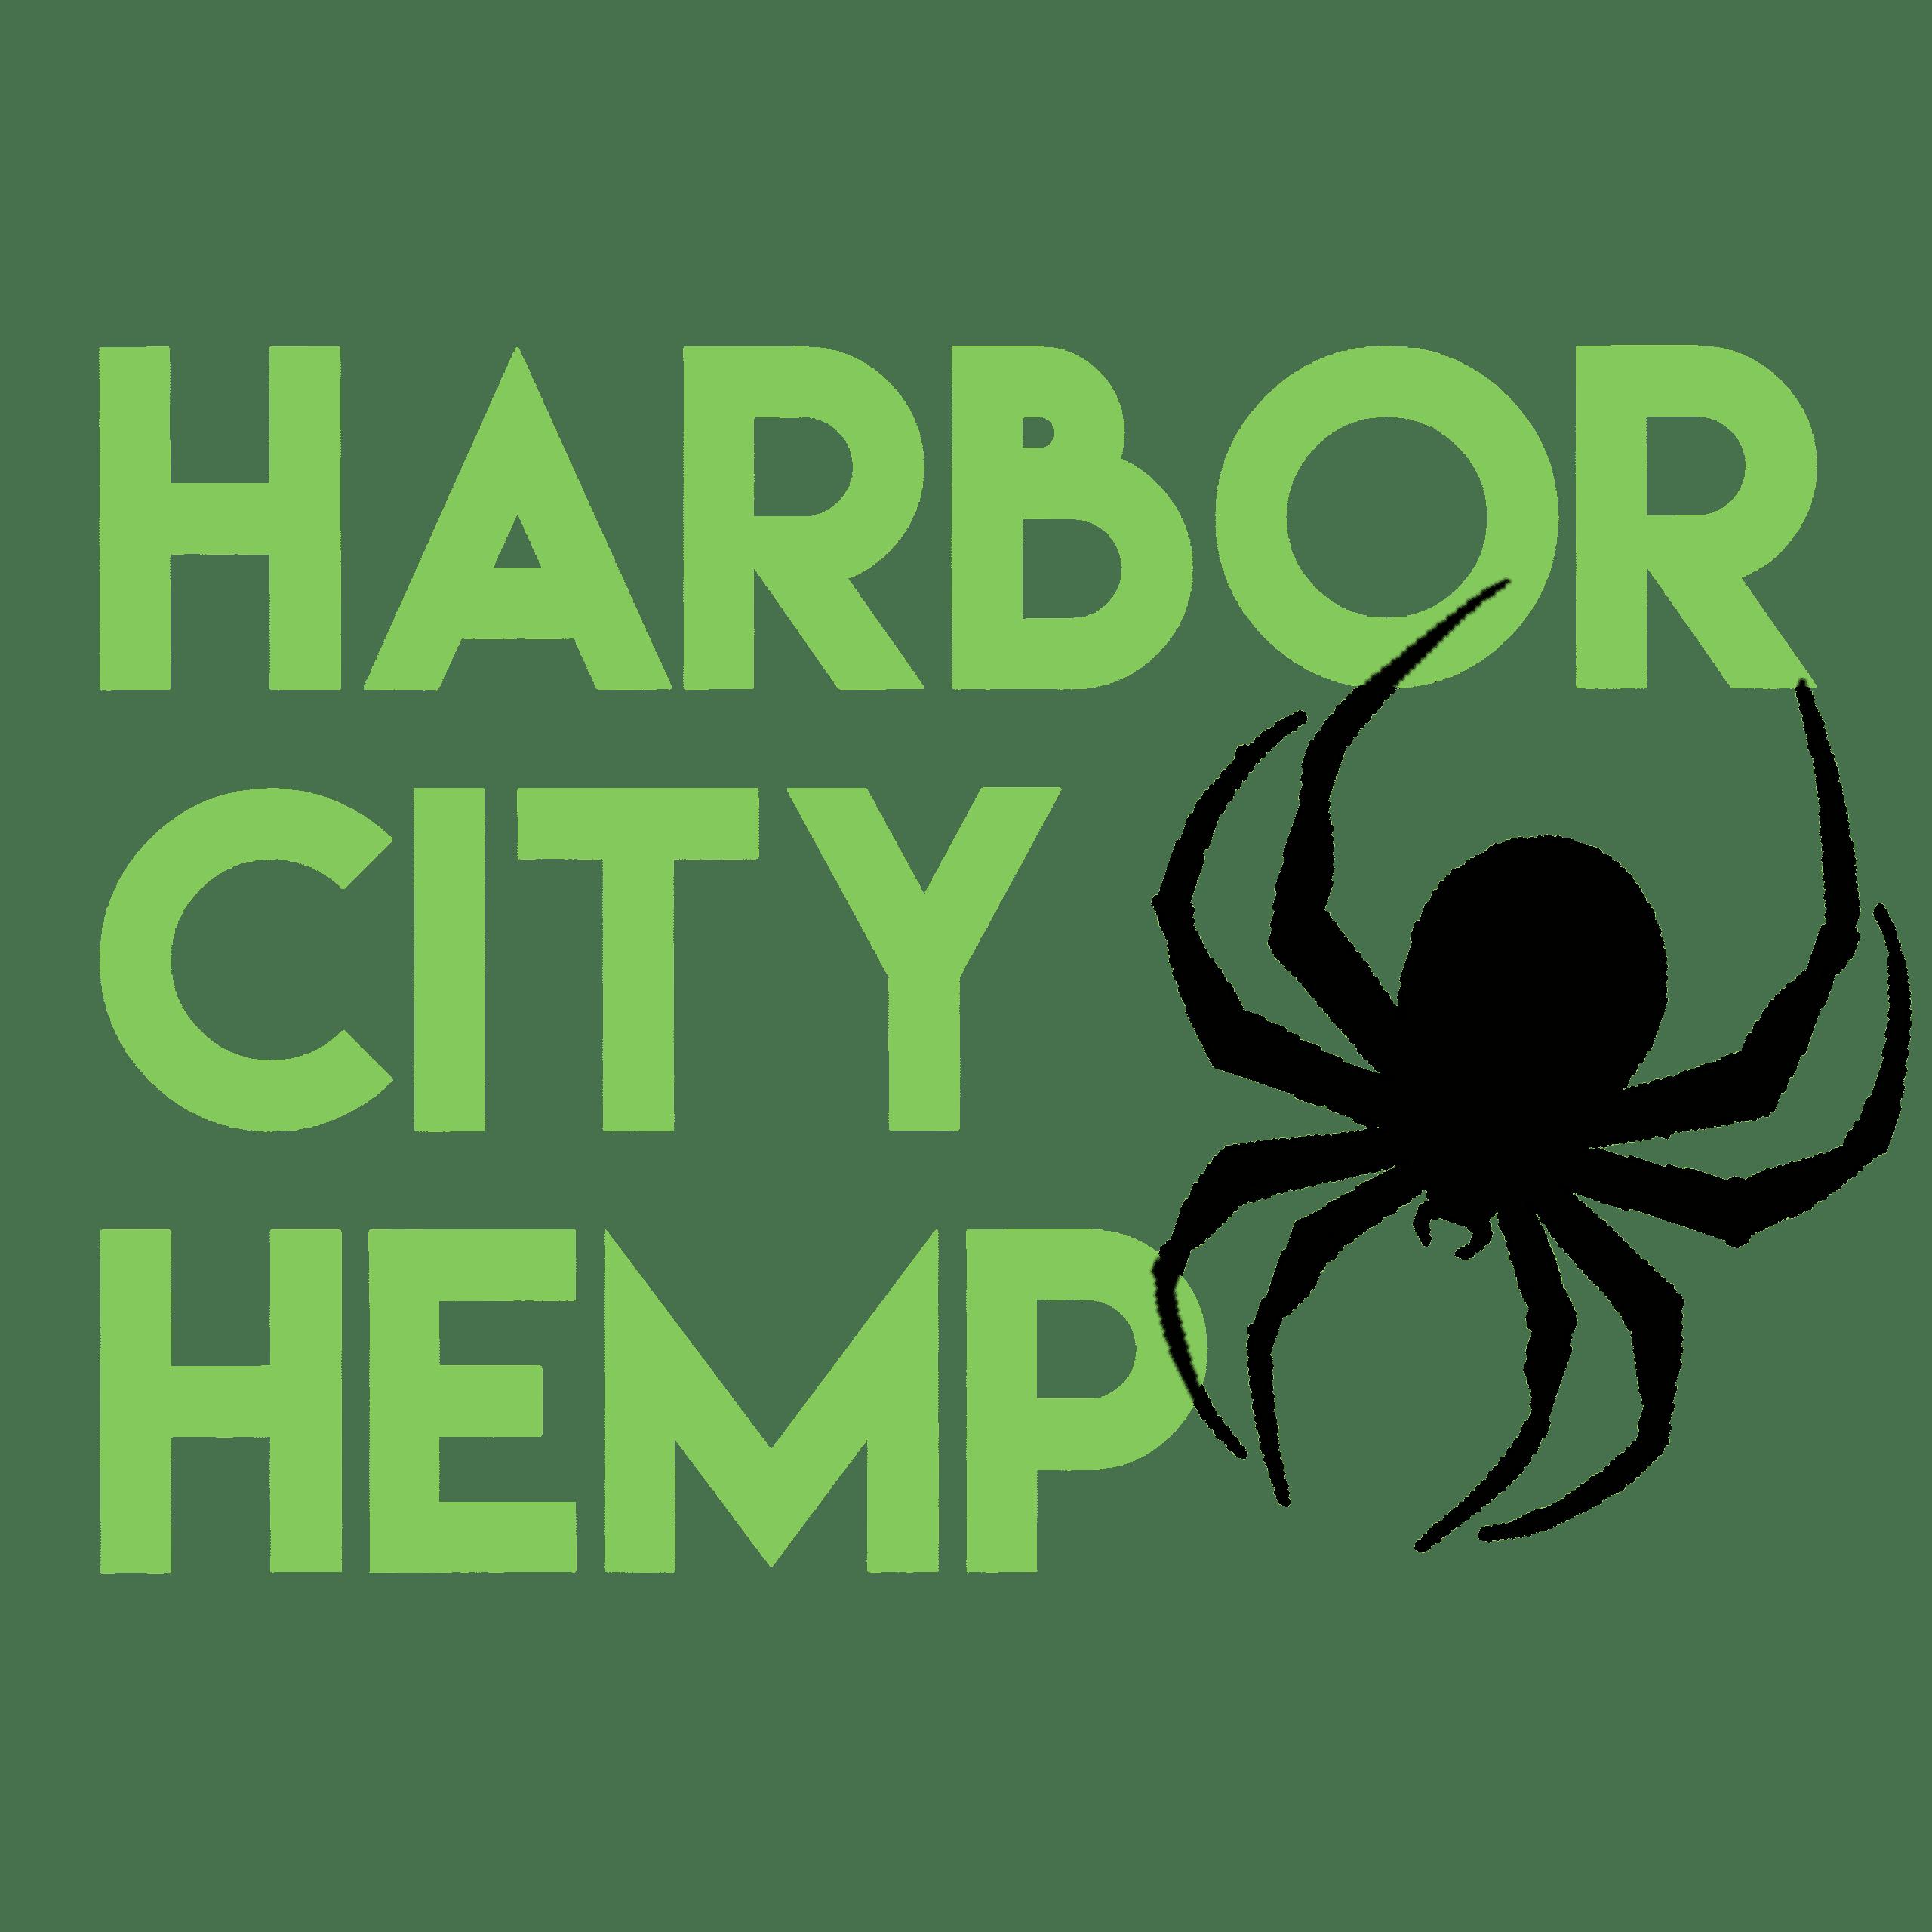 Harbor City Hemp